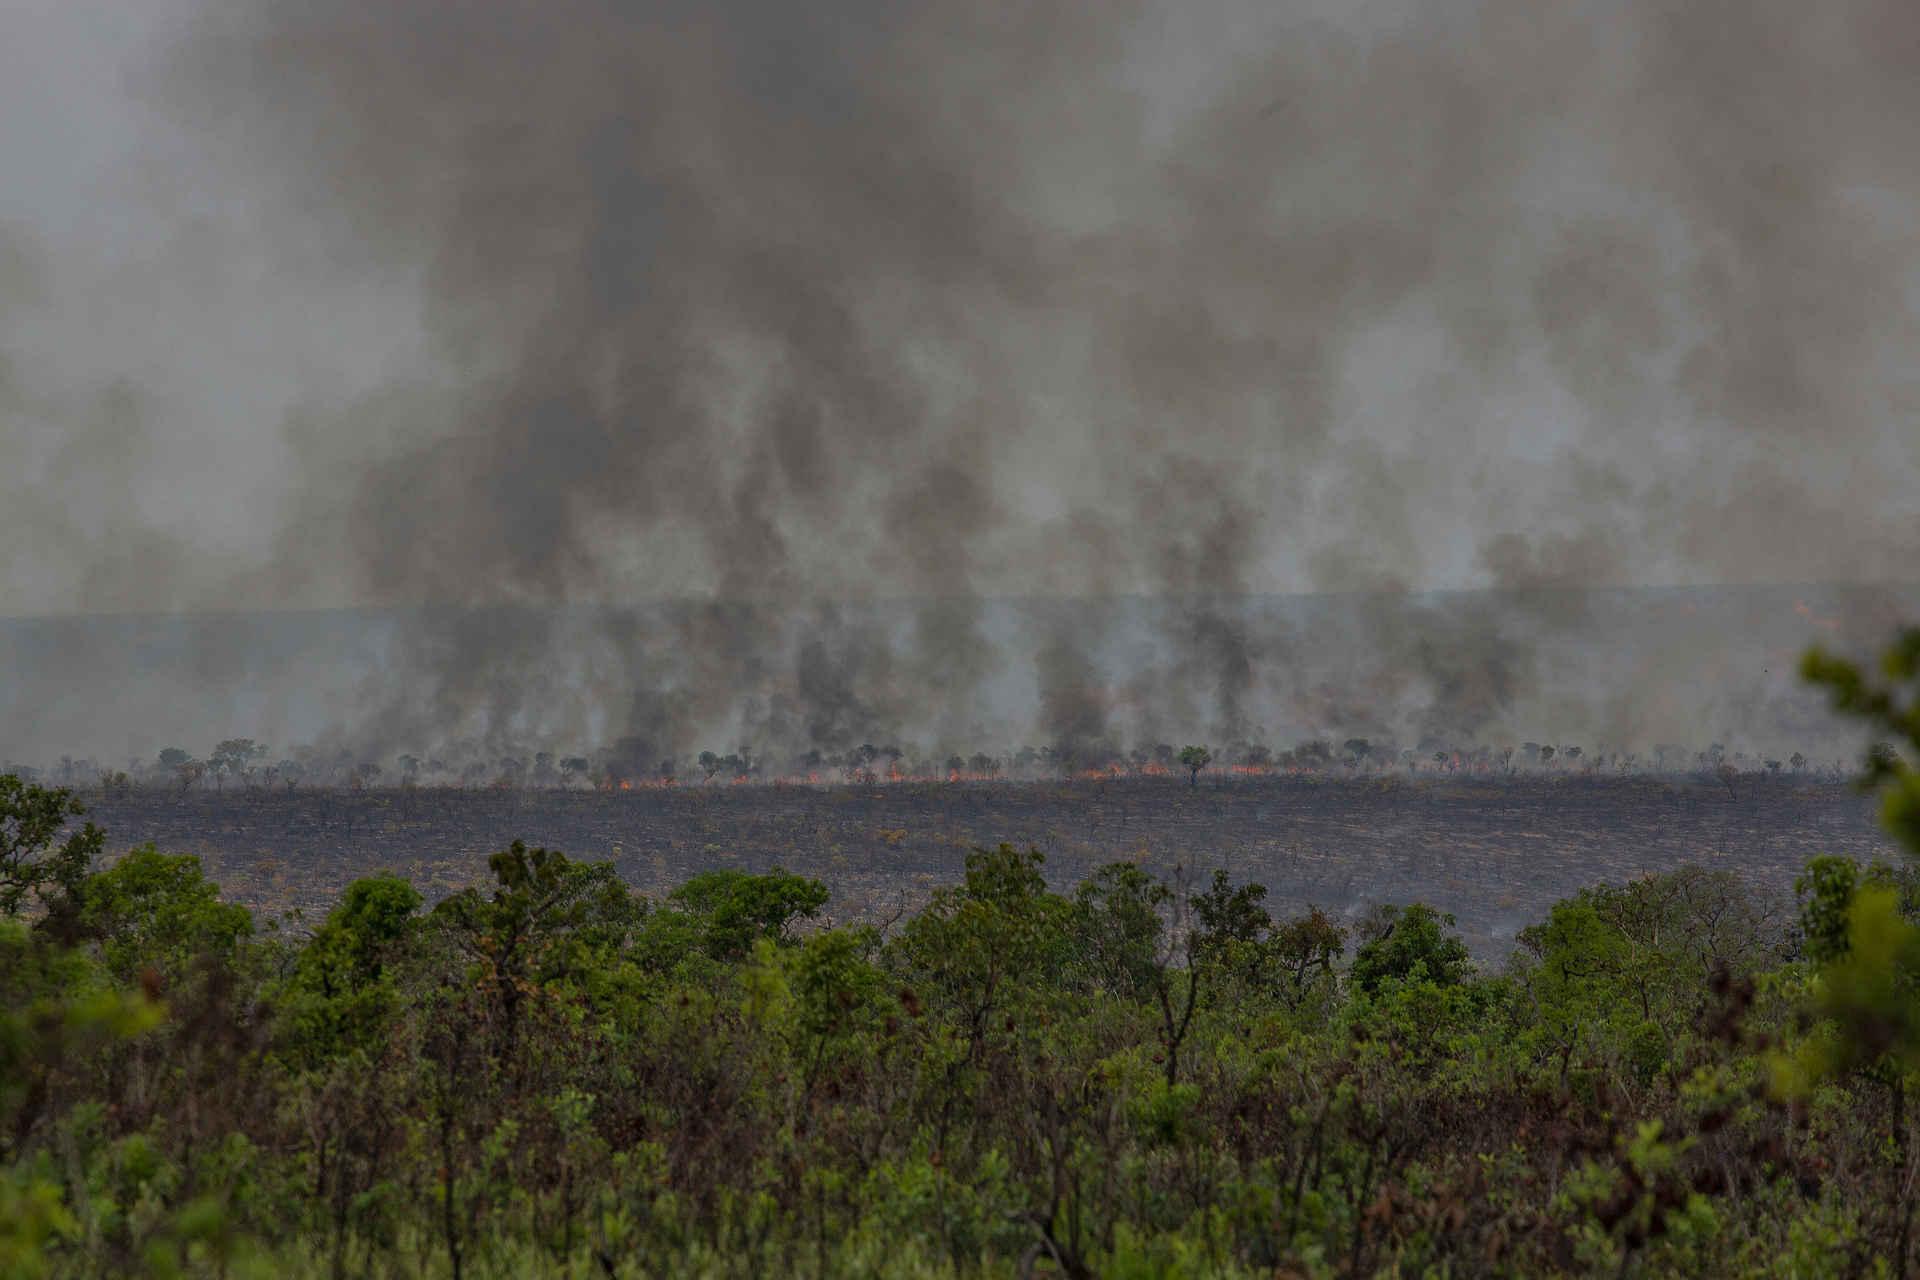 Cerrado: Brandrodung für Soja